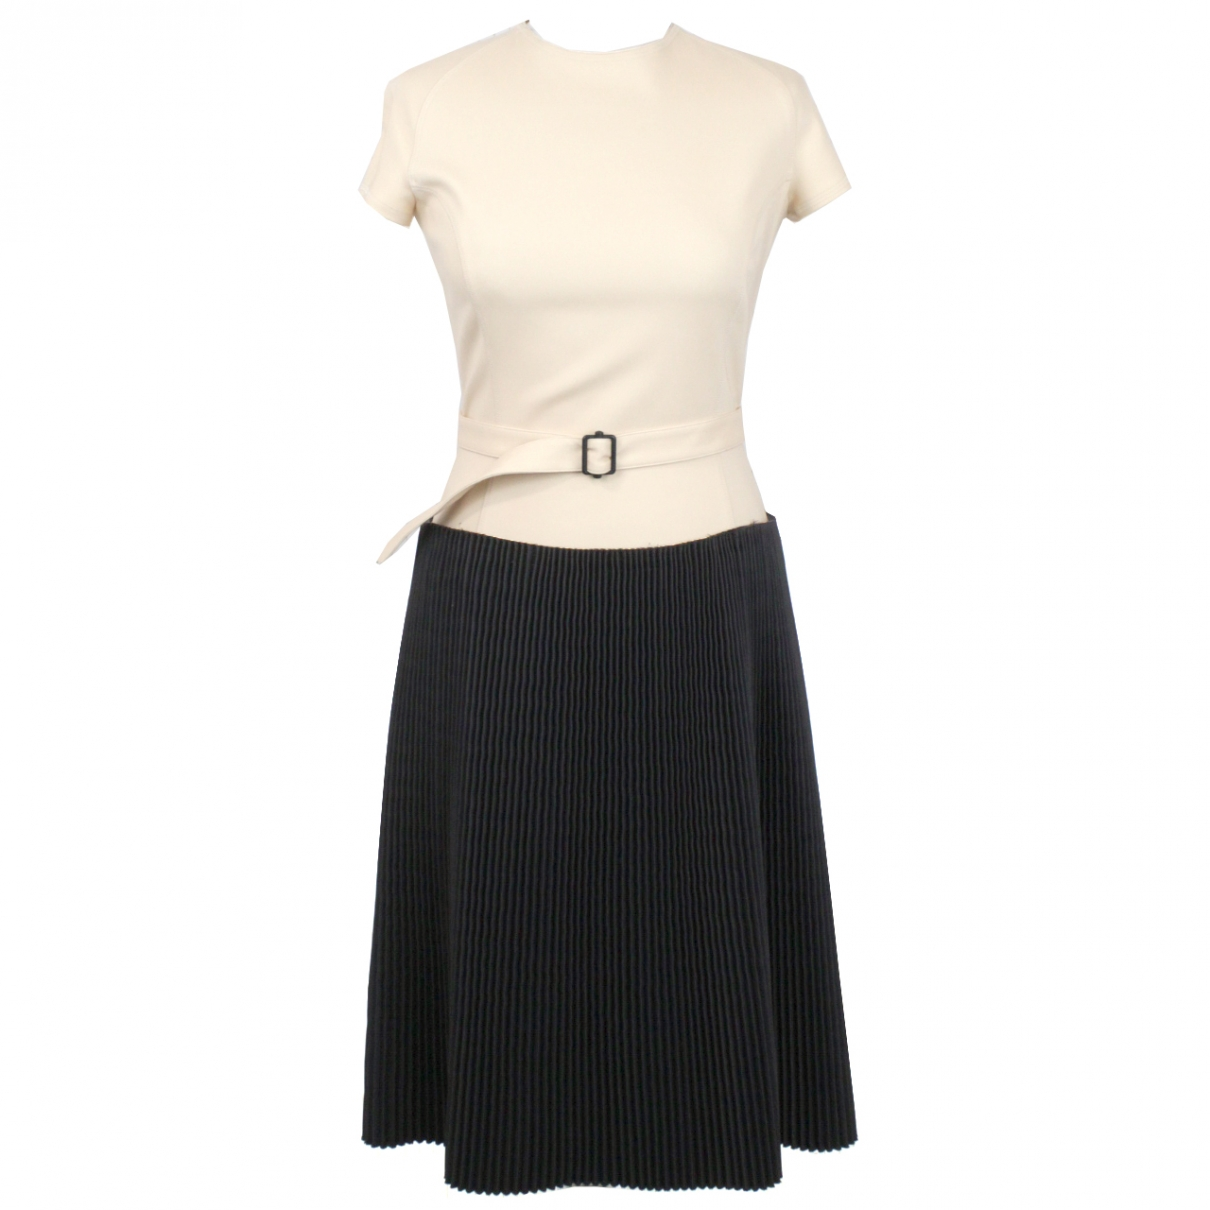 Bottega Veneta \N Kleid in  Ecru Polyester